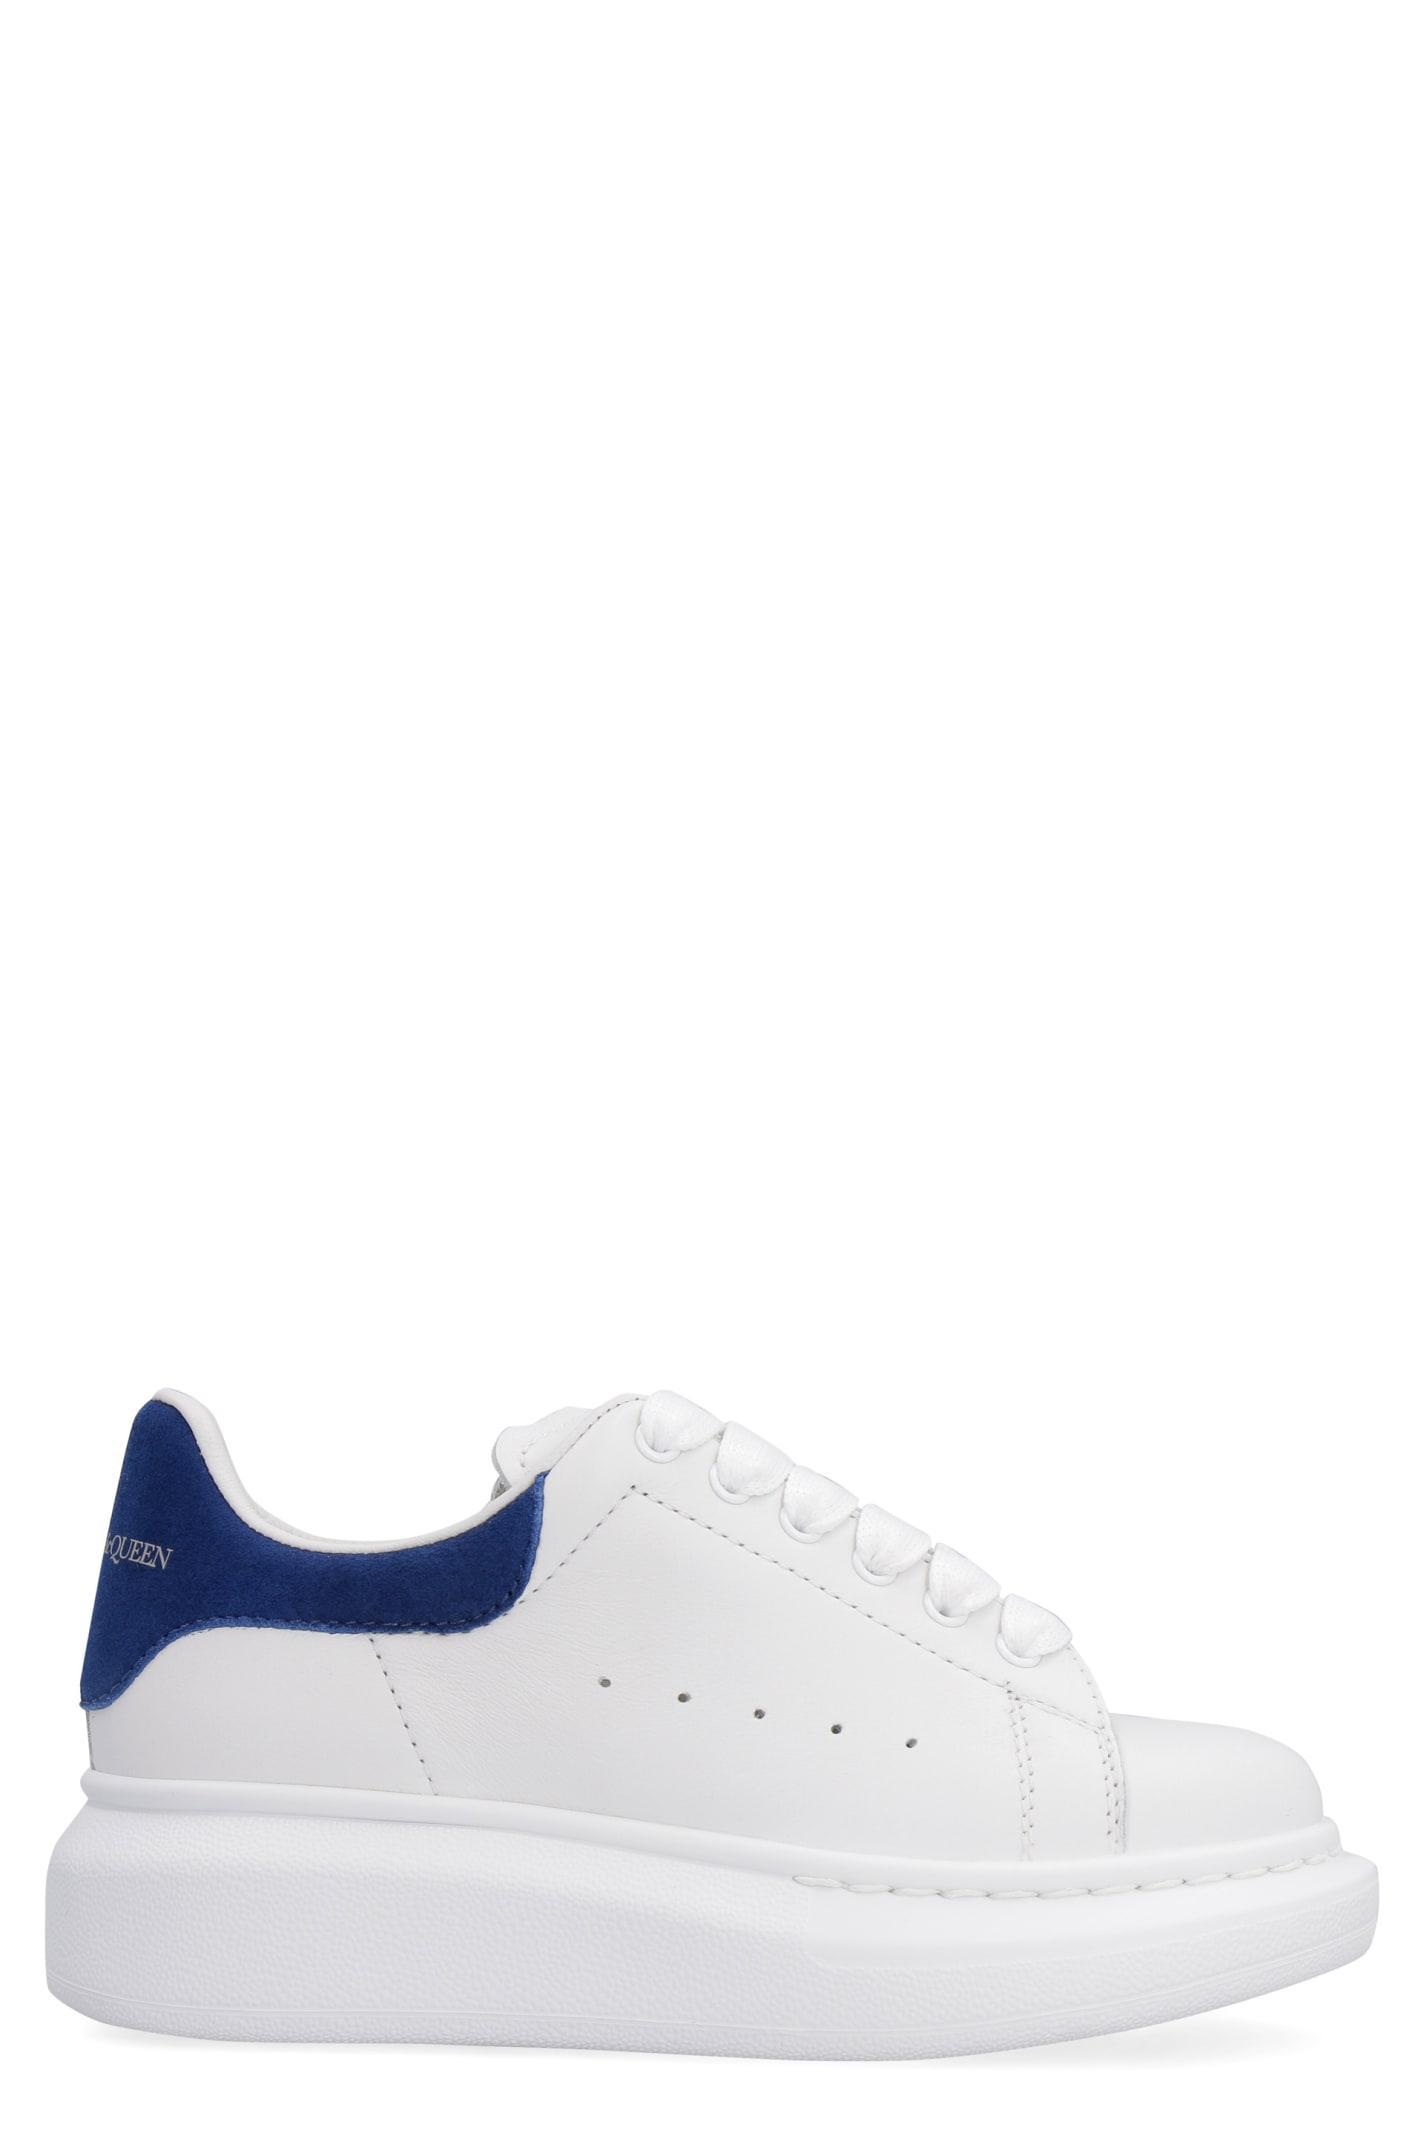 Alexander McQueen Molly Leather Low-top Sneakers